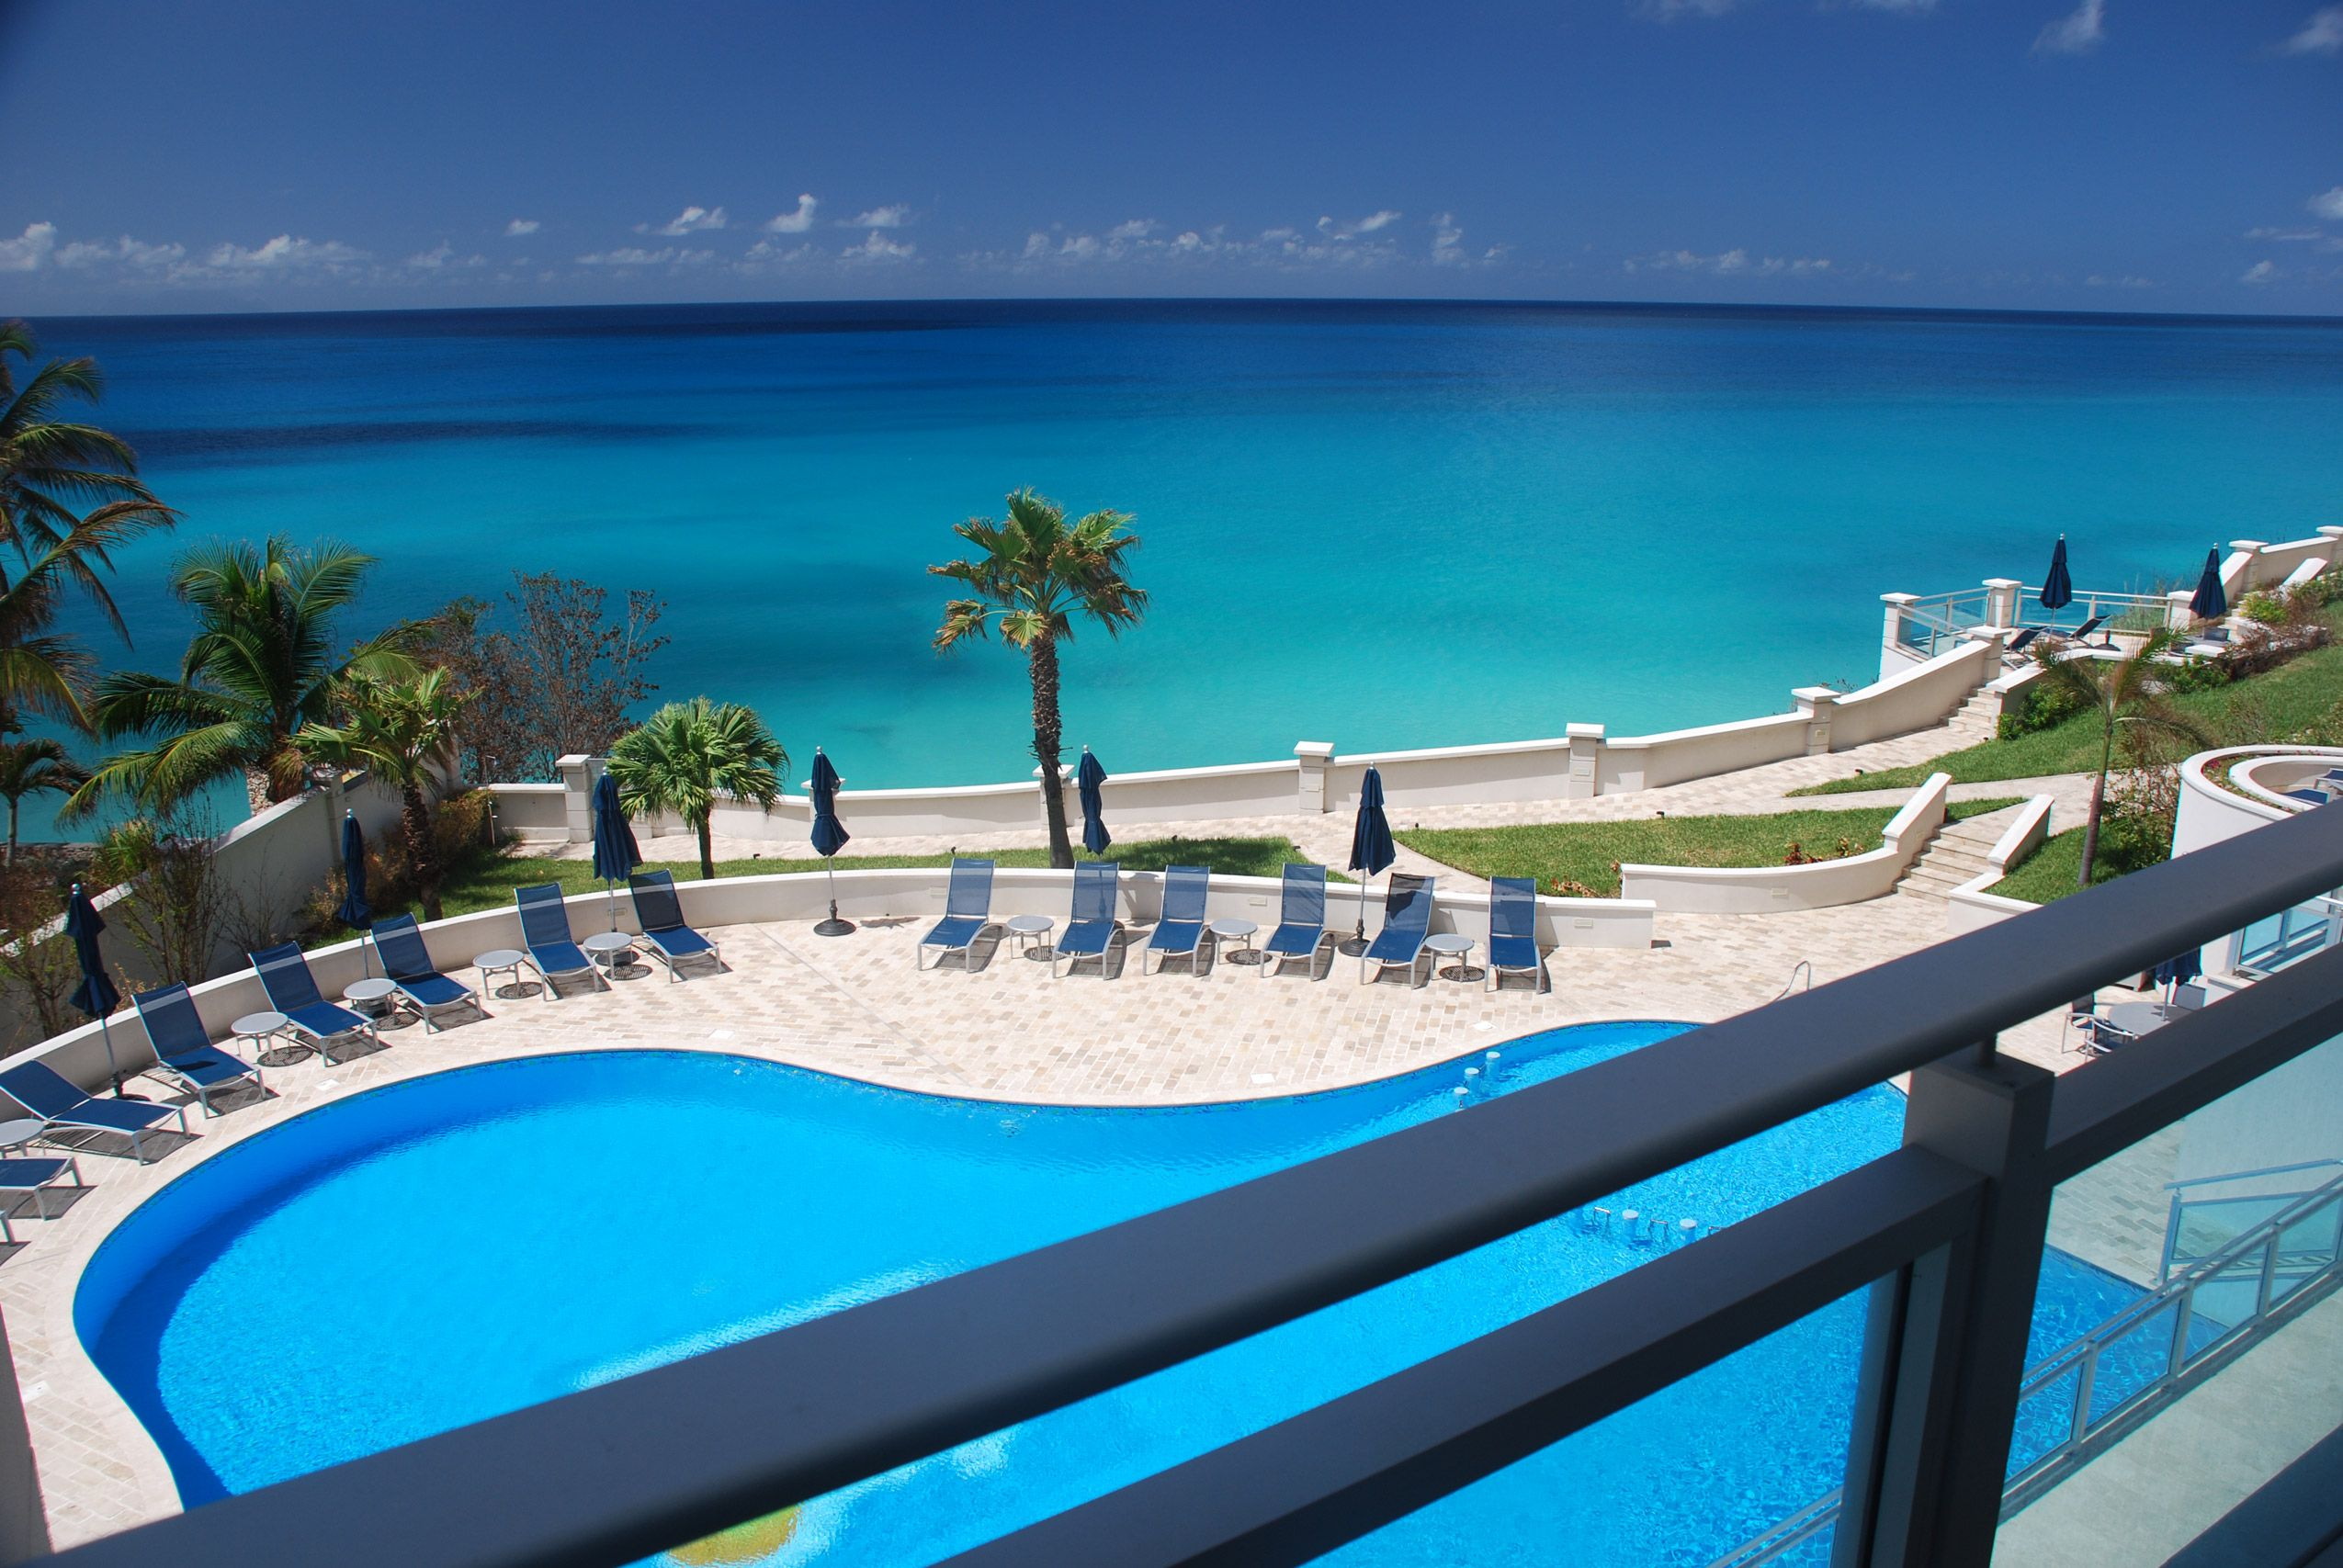 Image Detail for - Sarema, 2BR, Cupecoy Beach, St Maarten ...